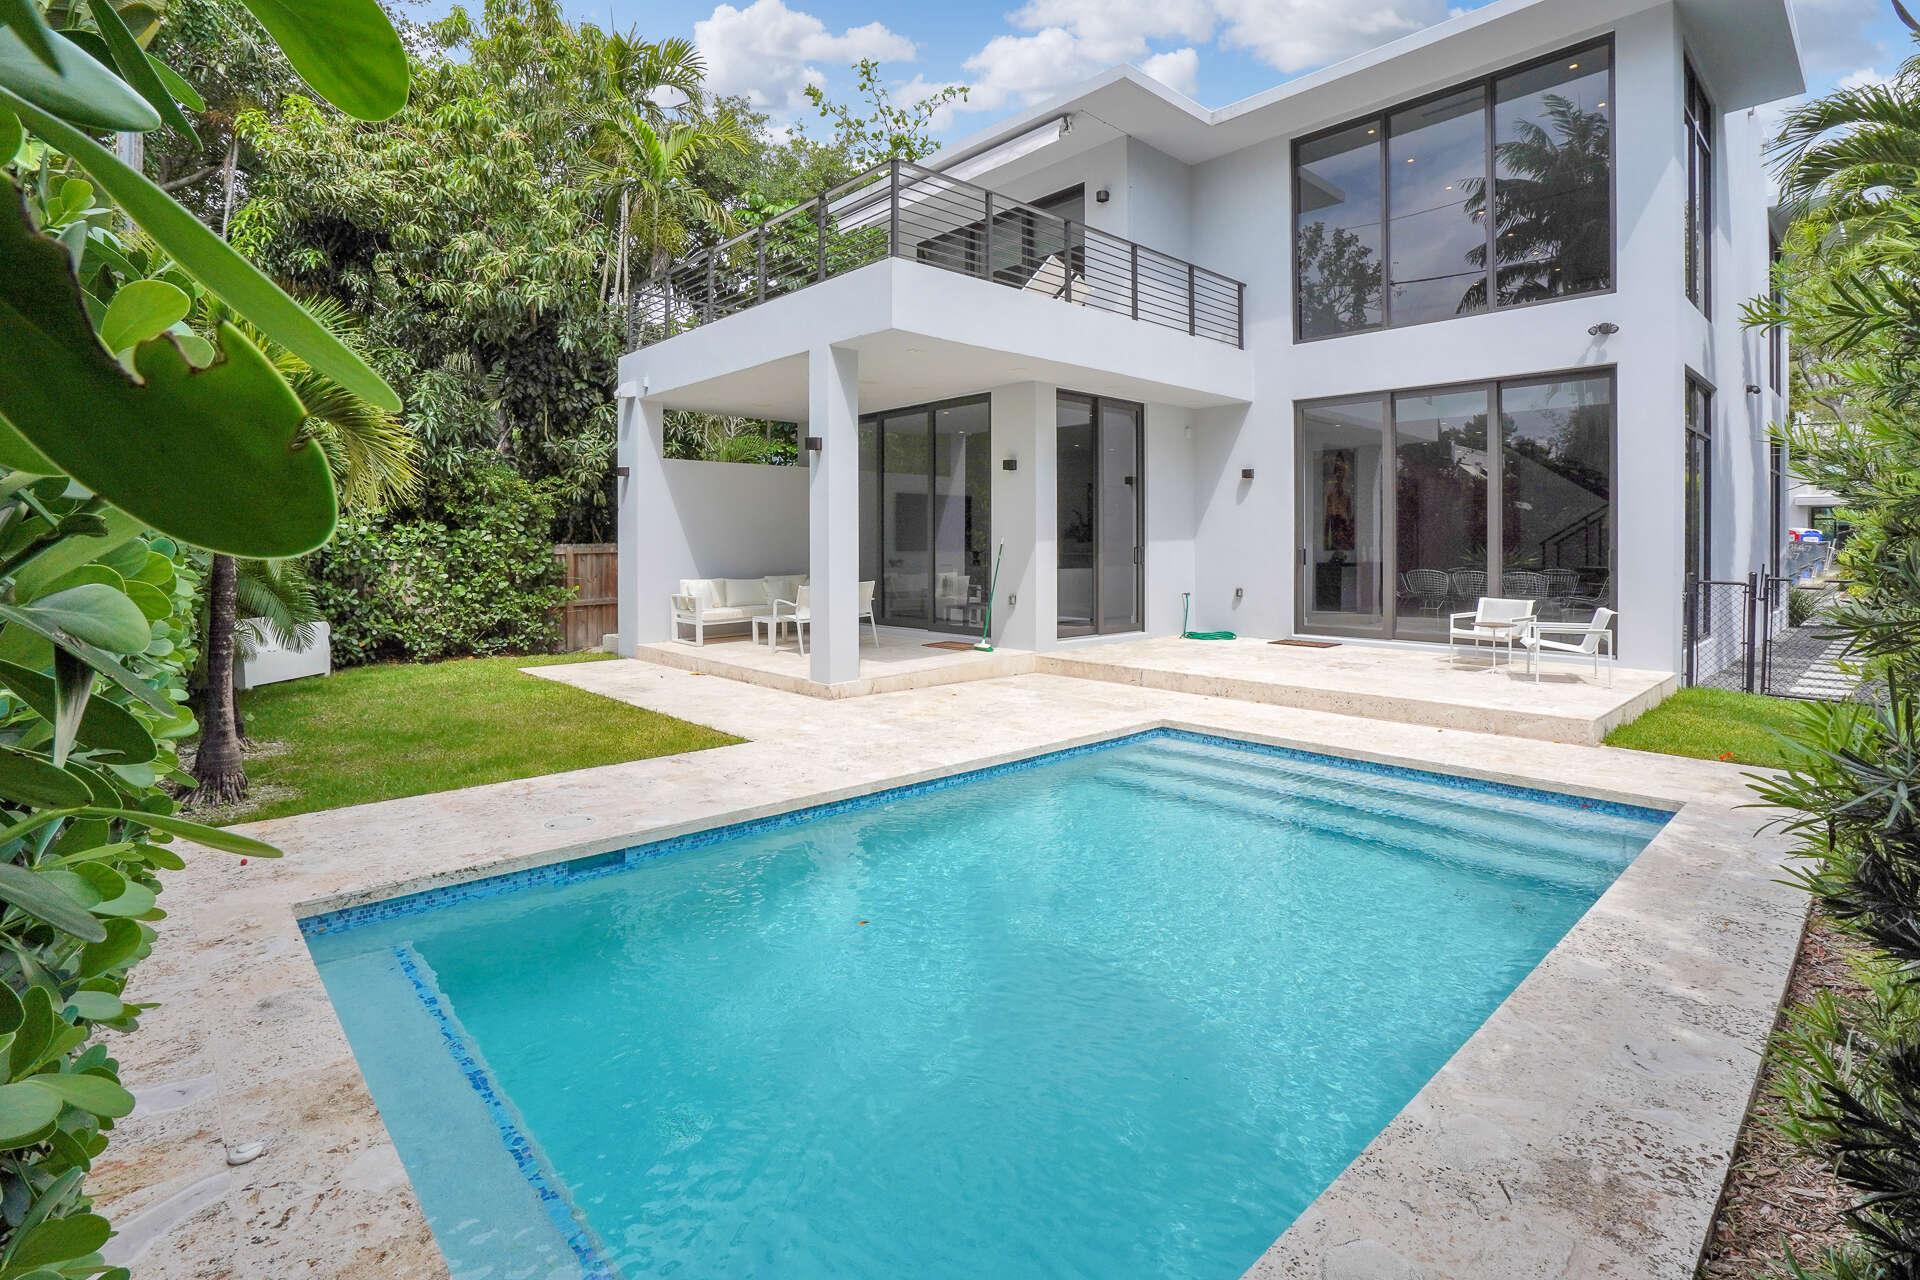 Luxury vacation rentals usa - Florida - Miami - Coconut grove  - Villa Grove - Image 1/40